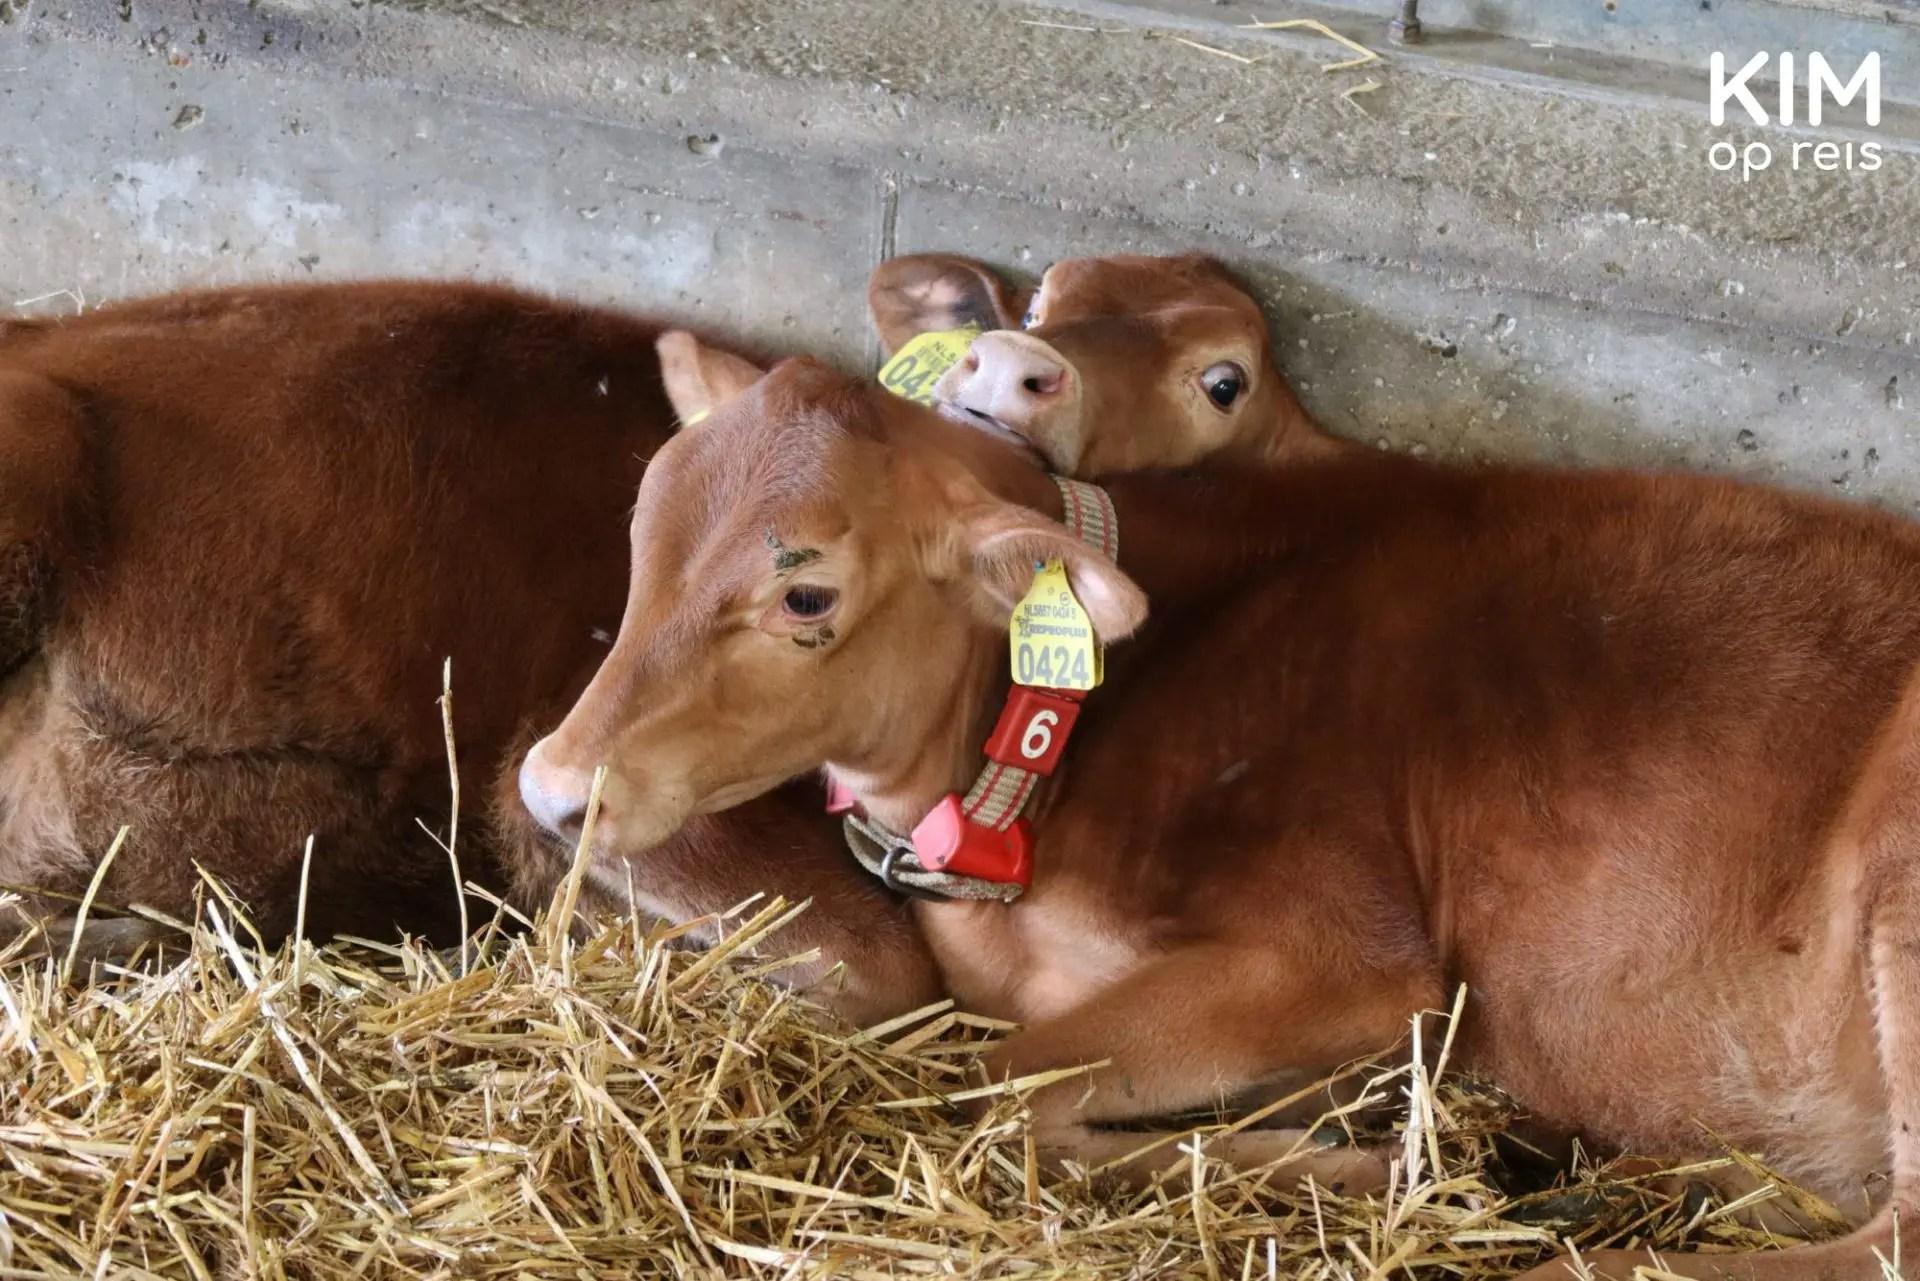 Calves at cheese farm Henri Willig - two calves lie against each other in the barn